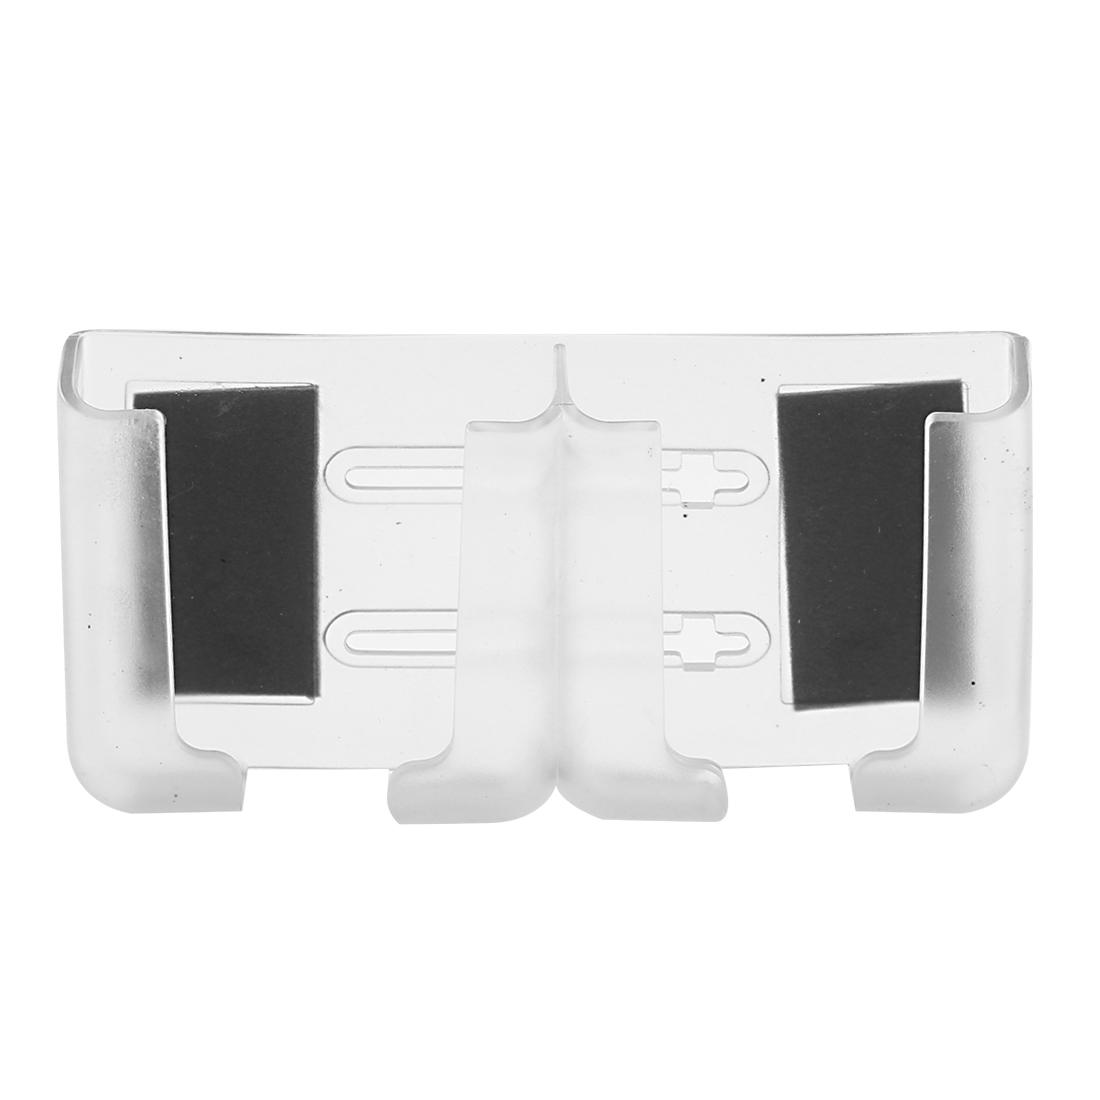 Clear Plastic Detachable Strip Smartphone GPS Card Car Holder